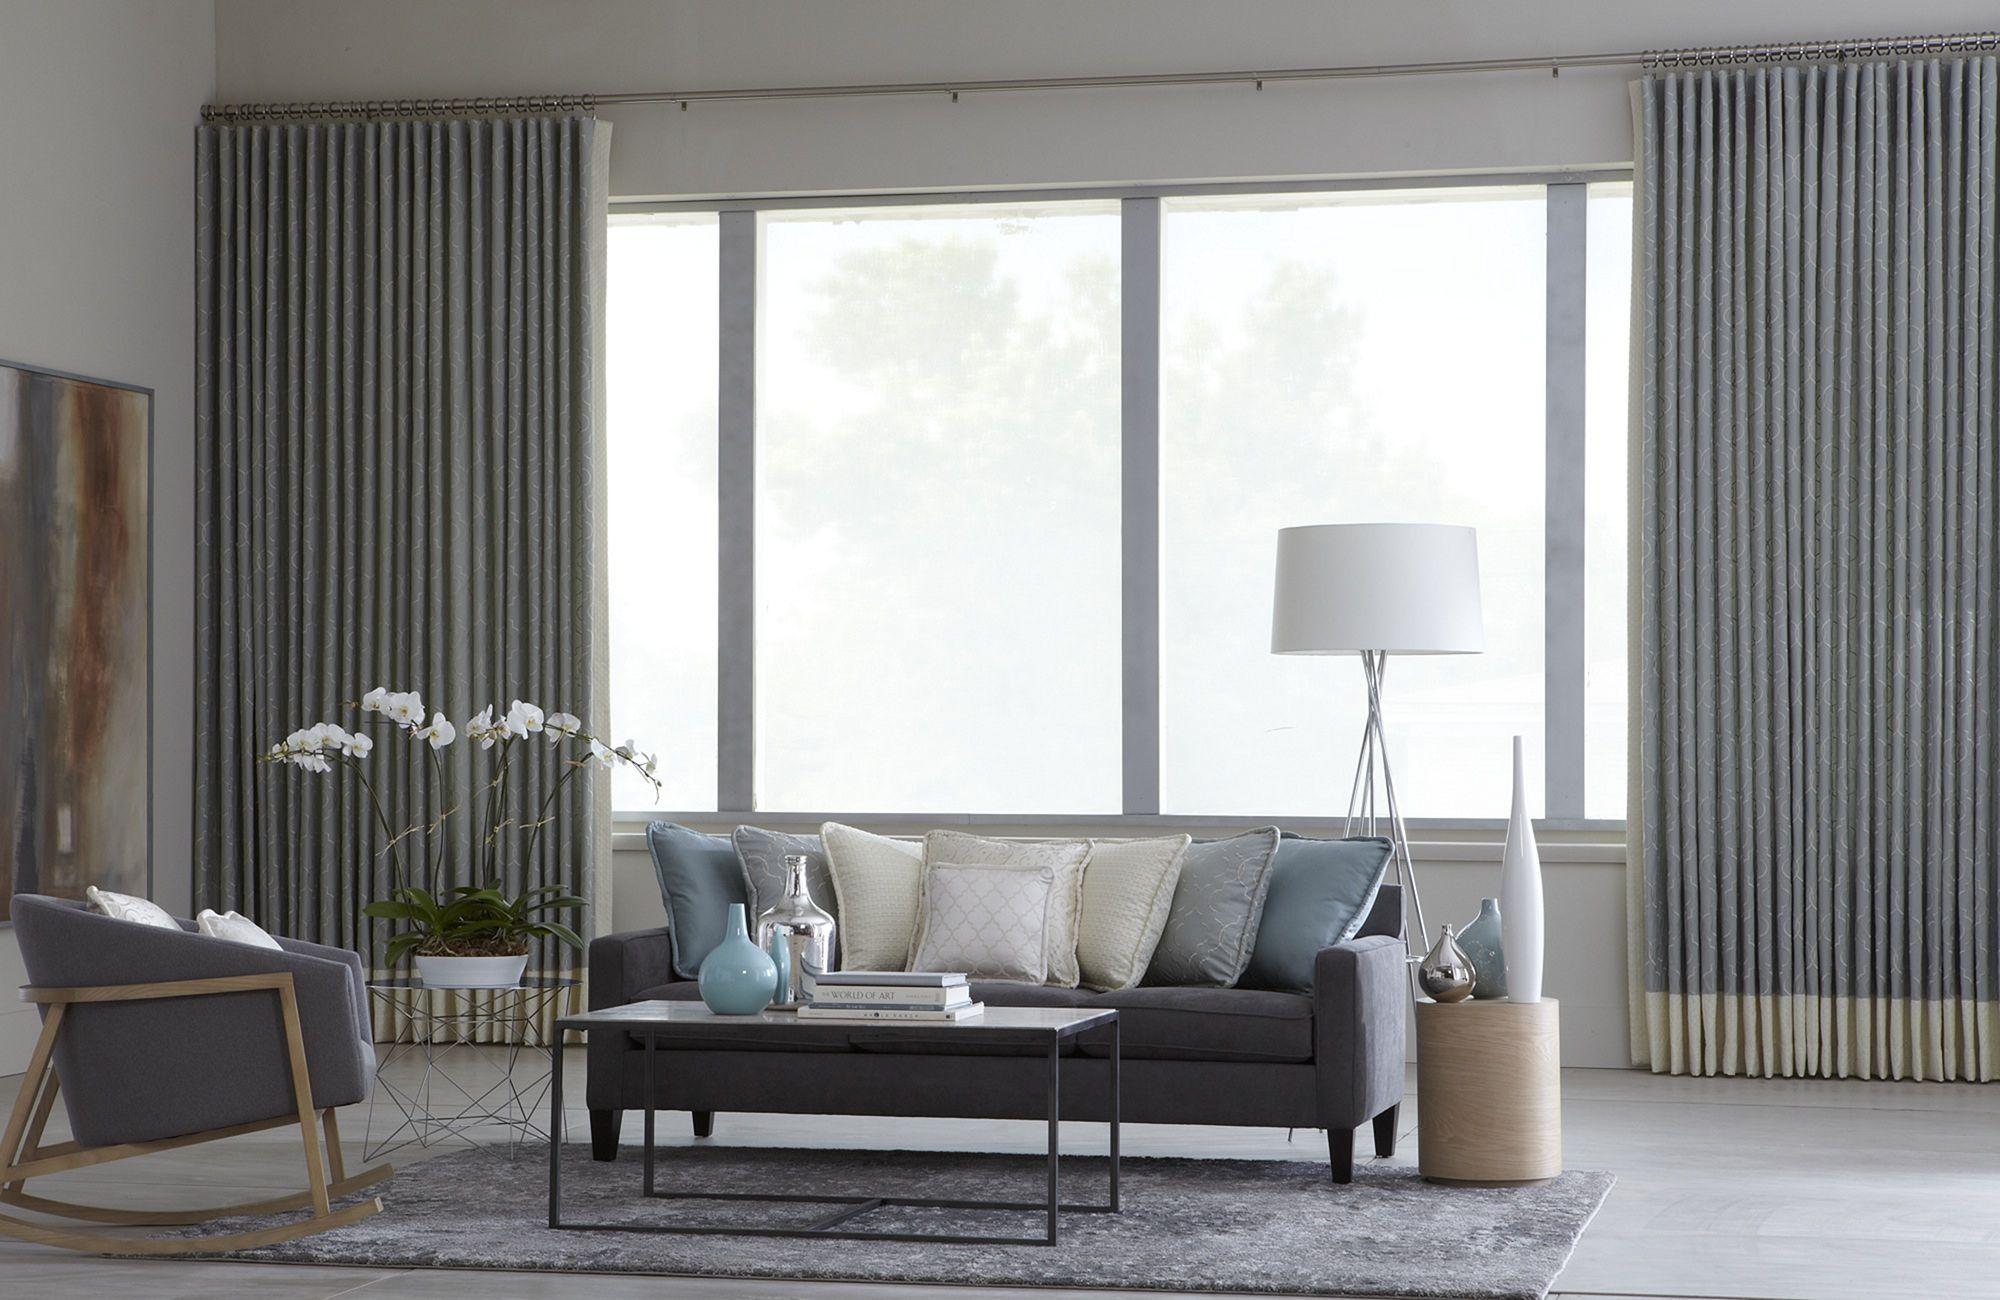 Minimalist Monochrome Curtains